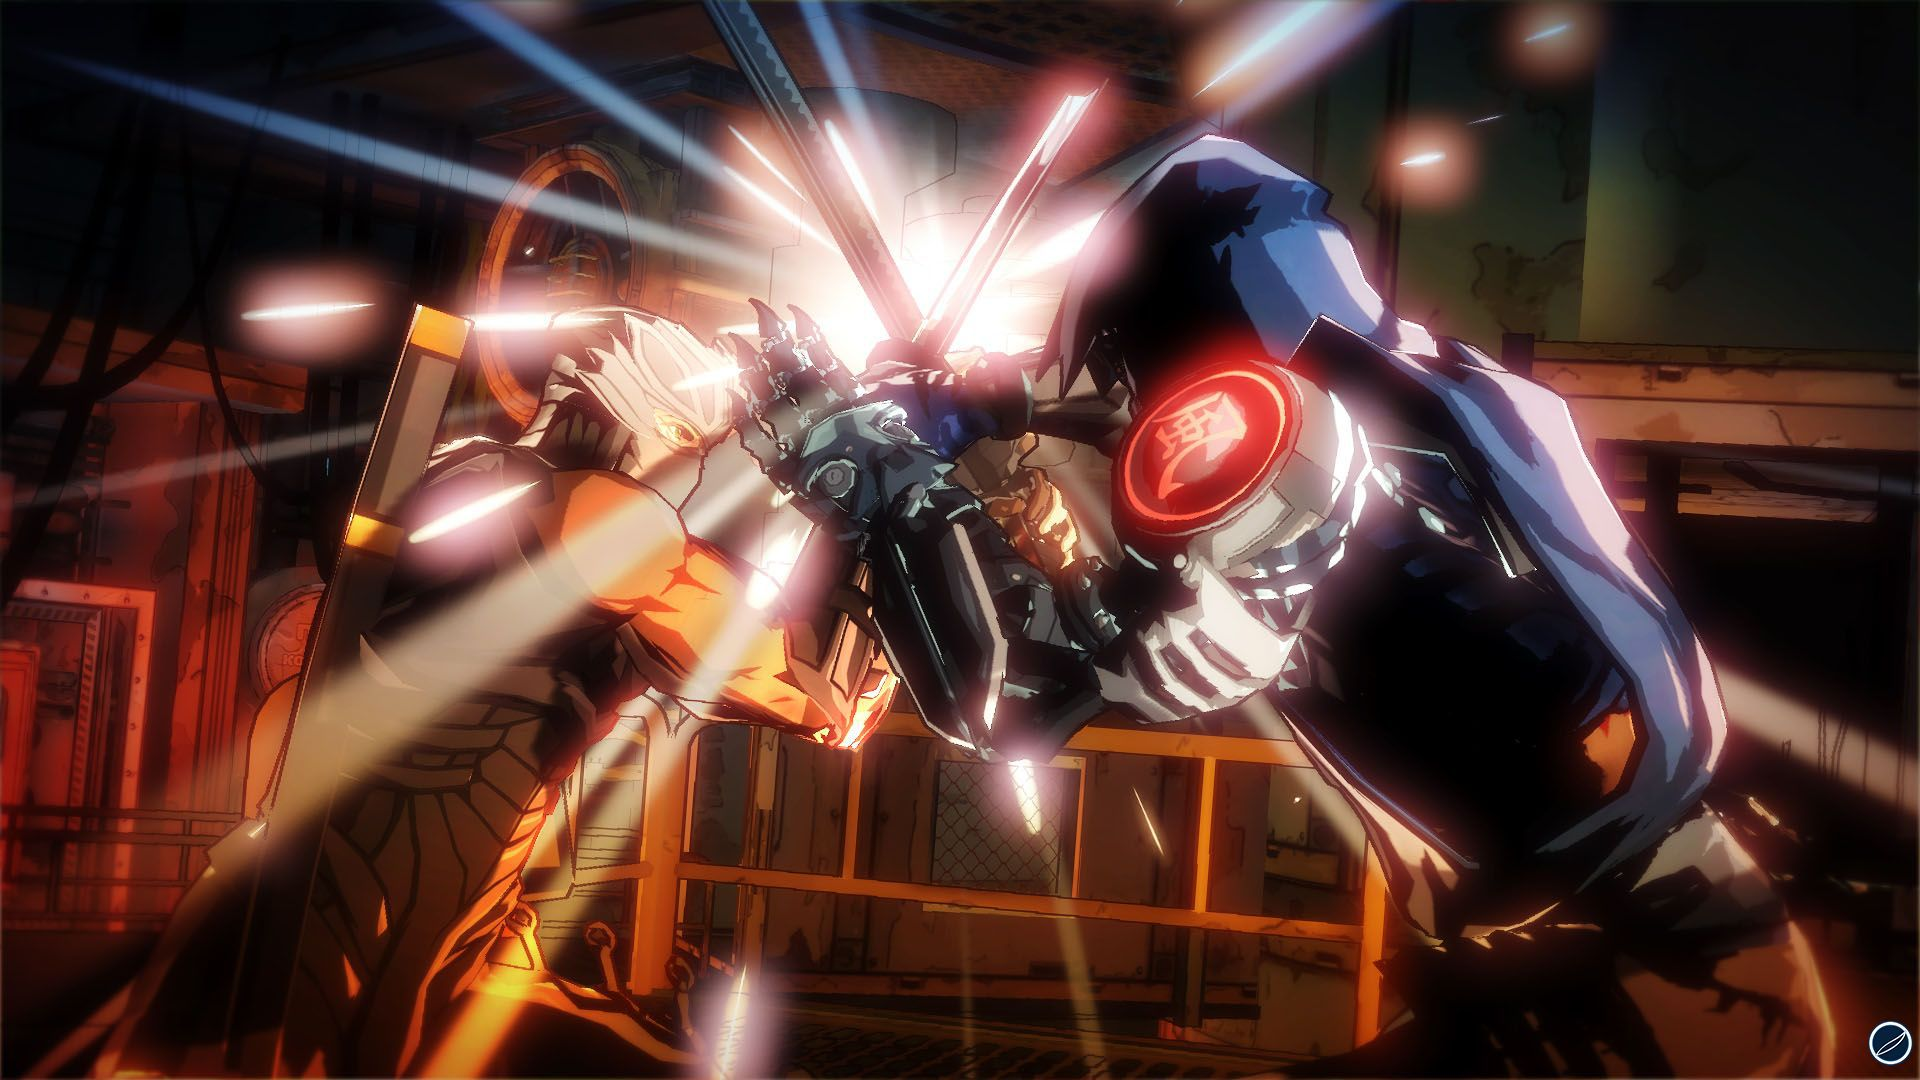 yaiba-ninja-gaiden-z_PS3_w_4368.jpg